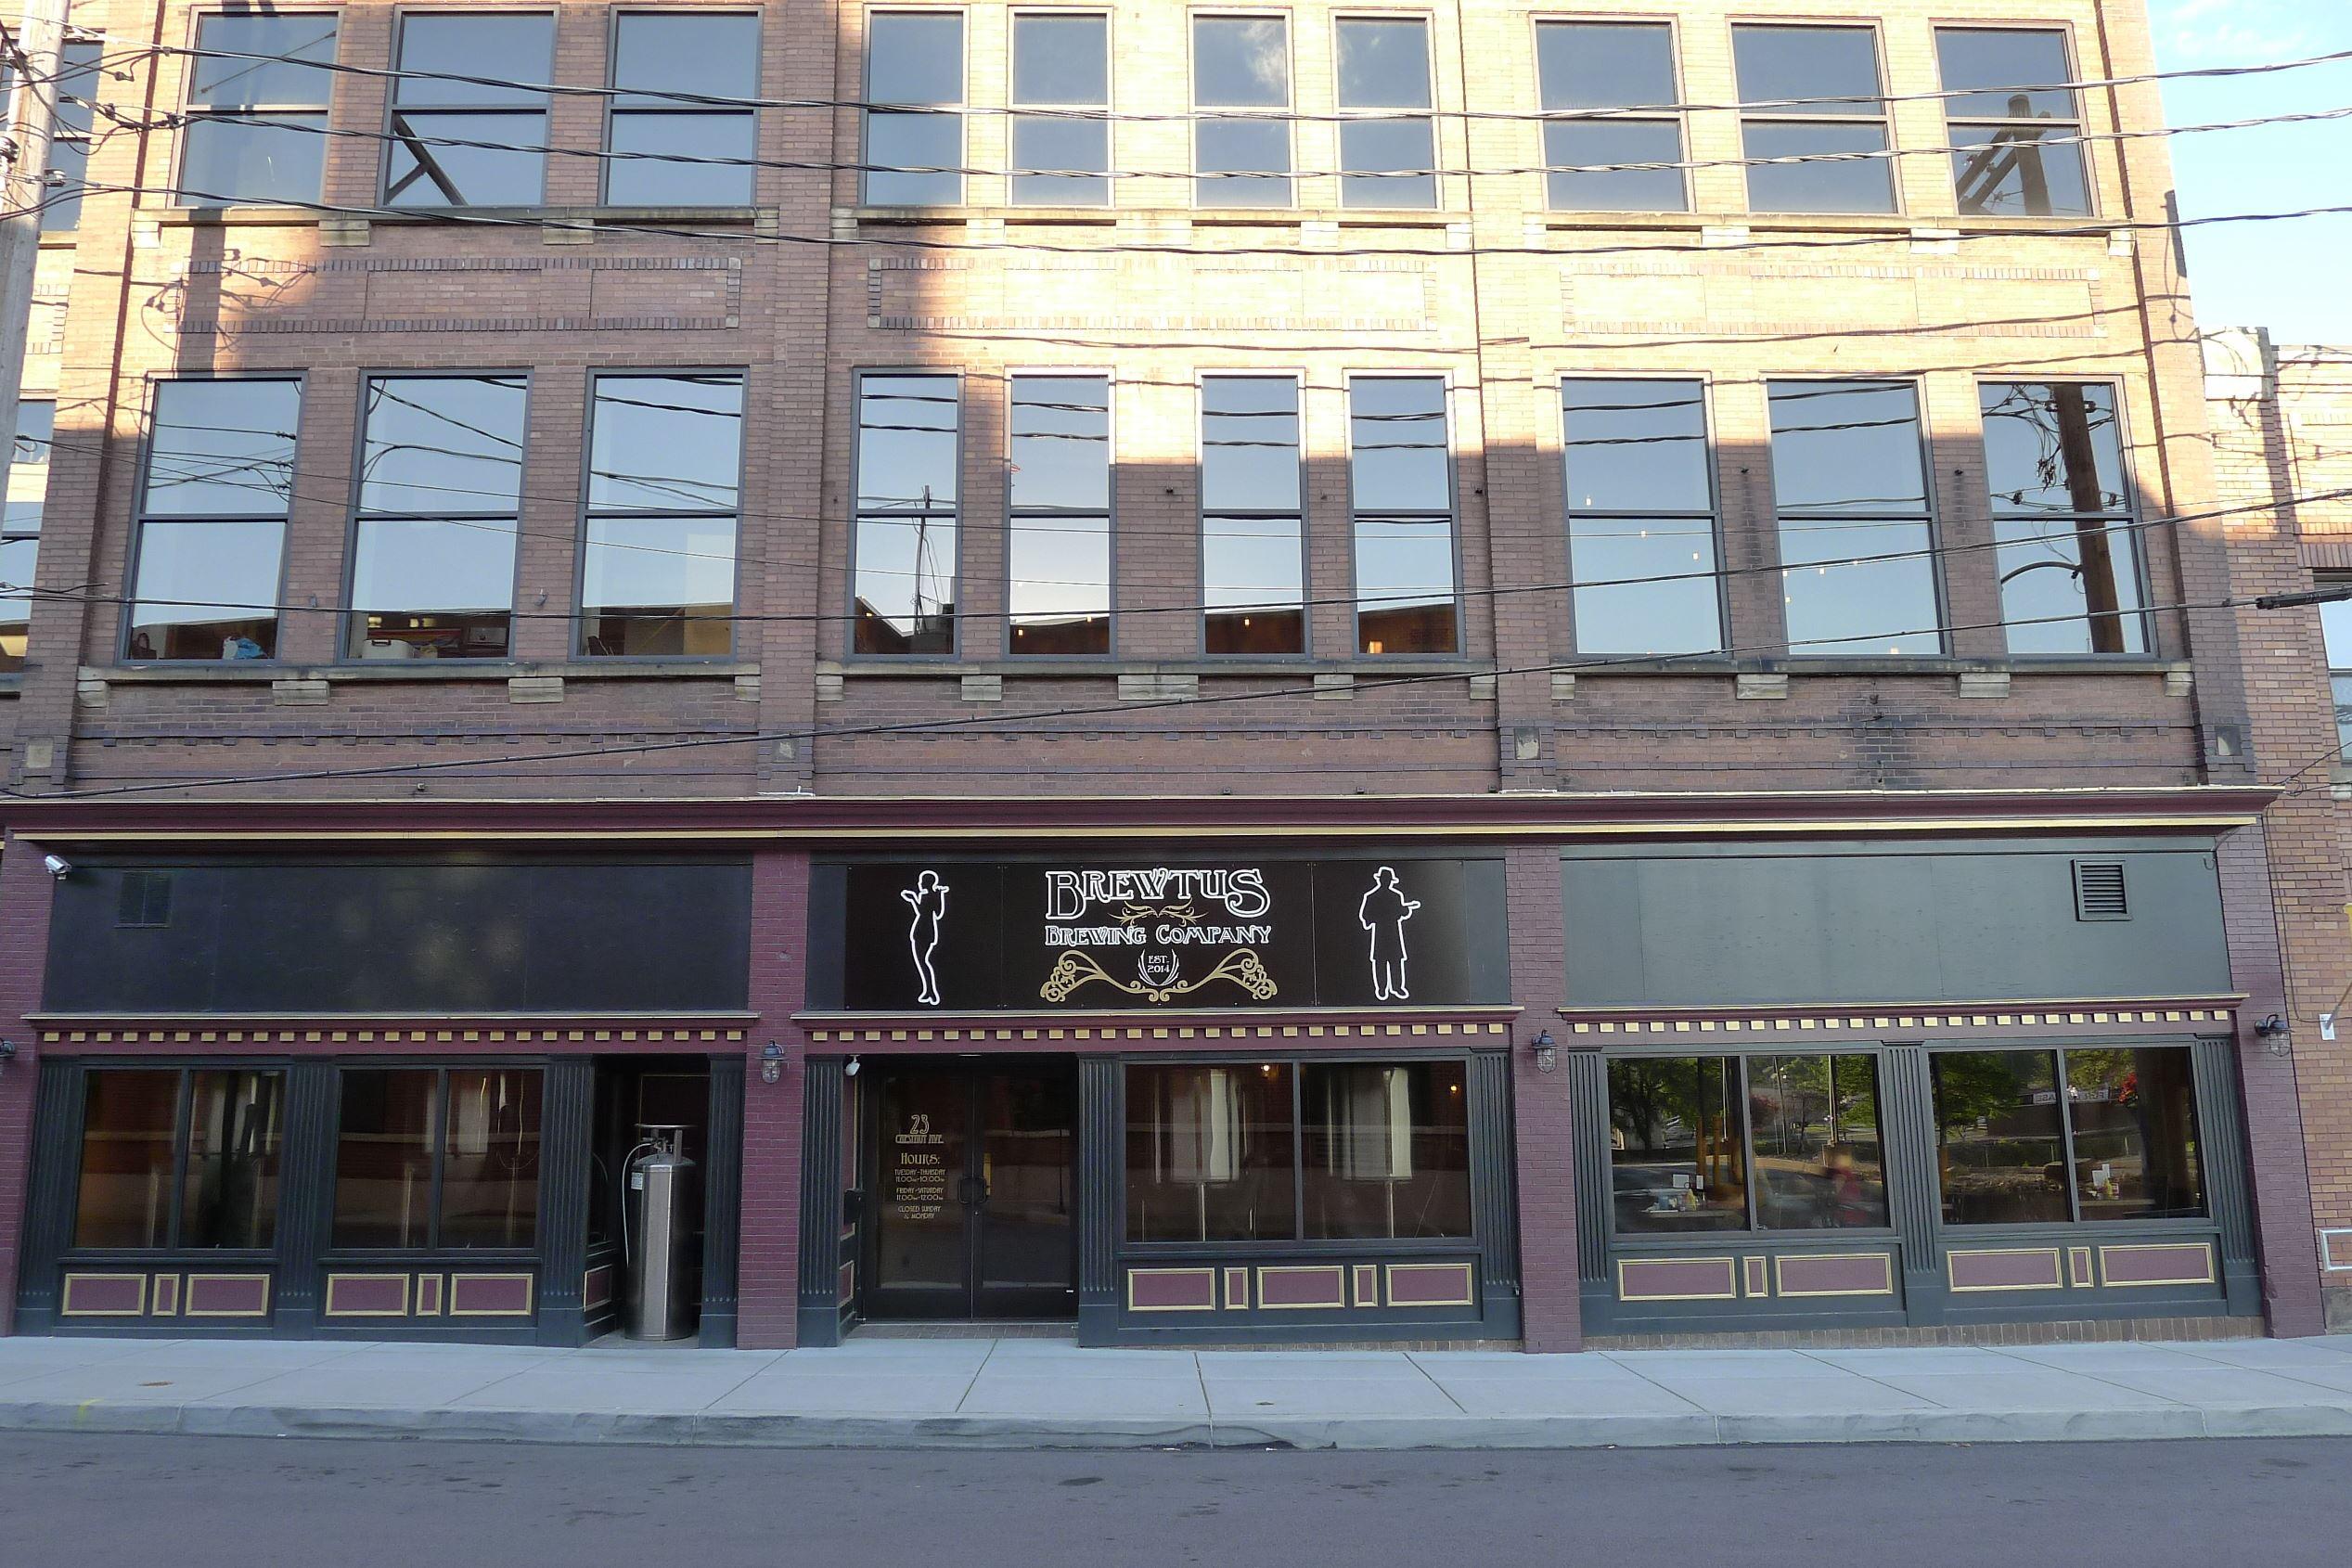 P1250995-9 The facade of Brewtus Brewing Co. in Sharon, PA.